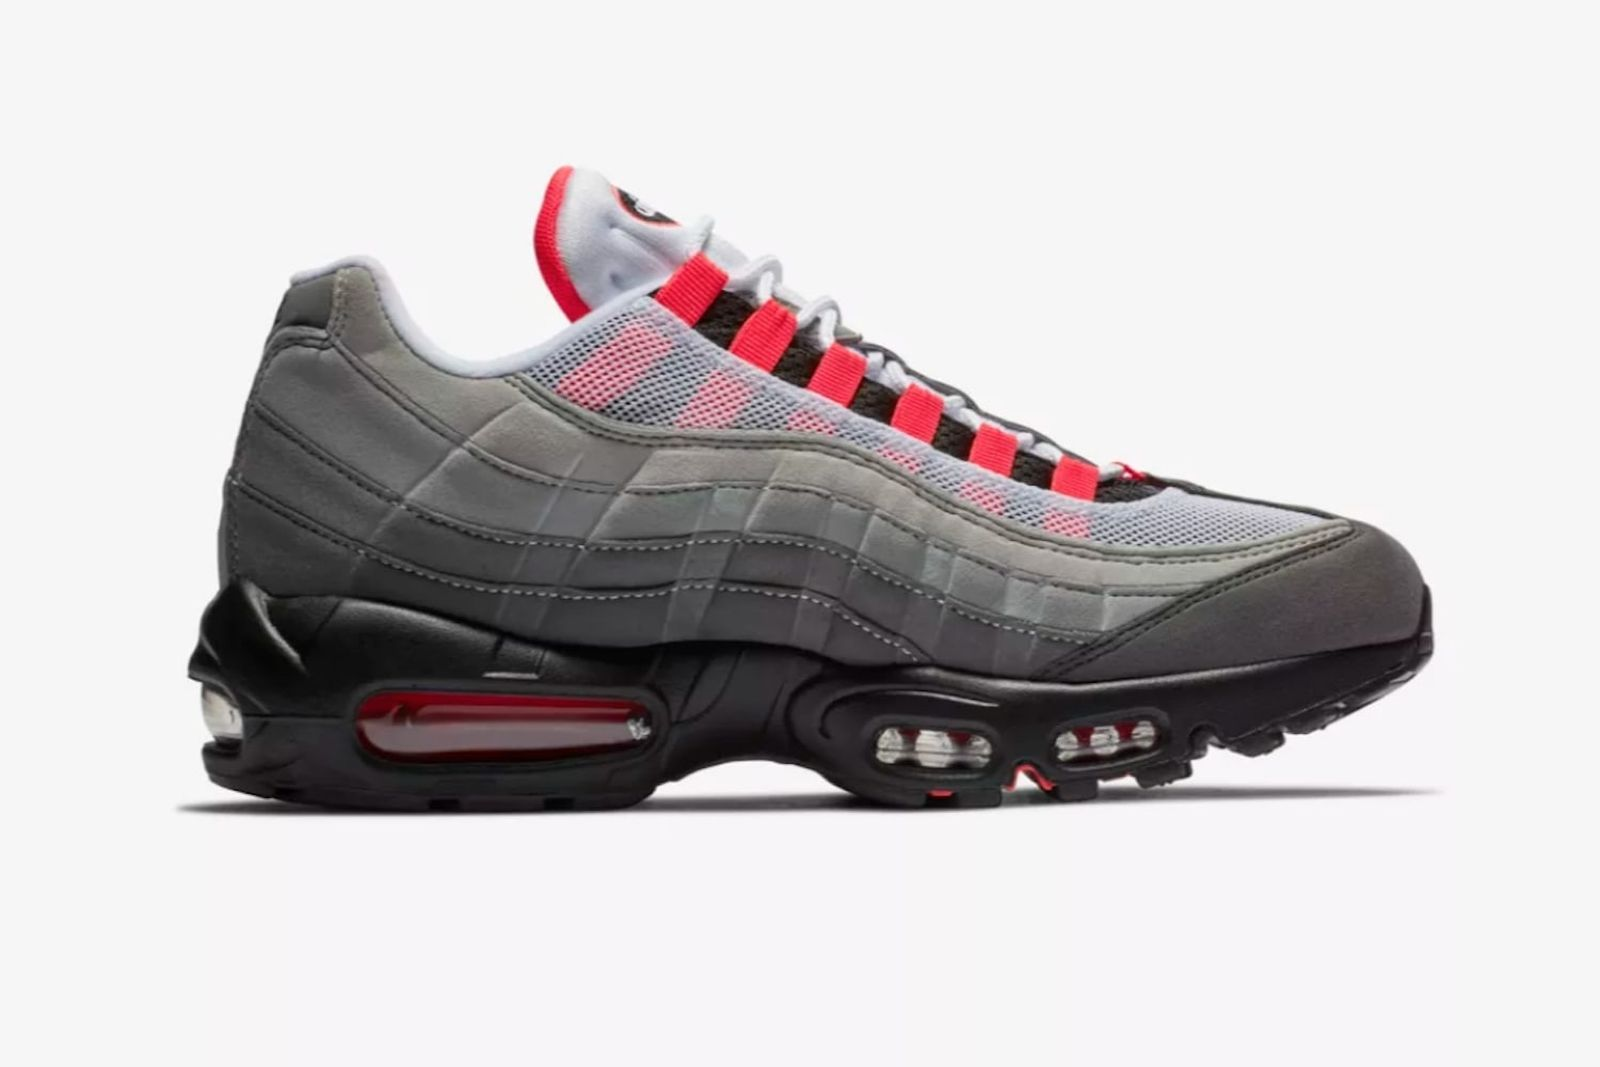 abortar Recomendado discordia  Nike Air Max 95